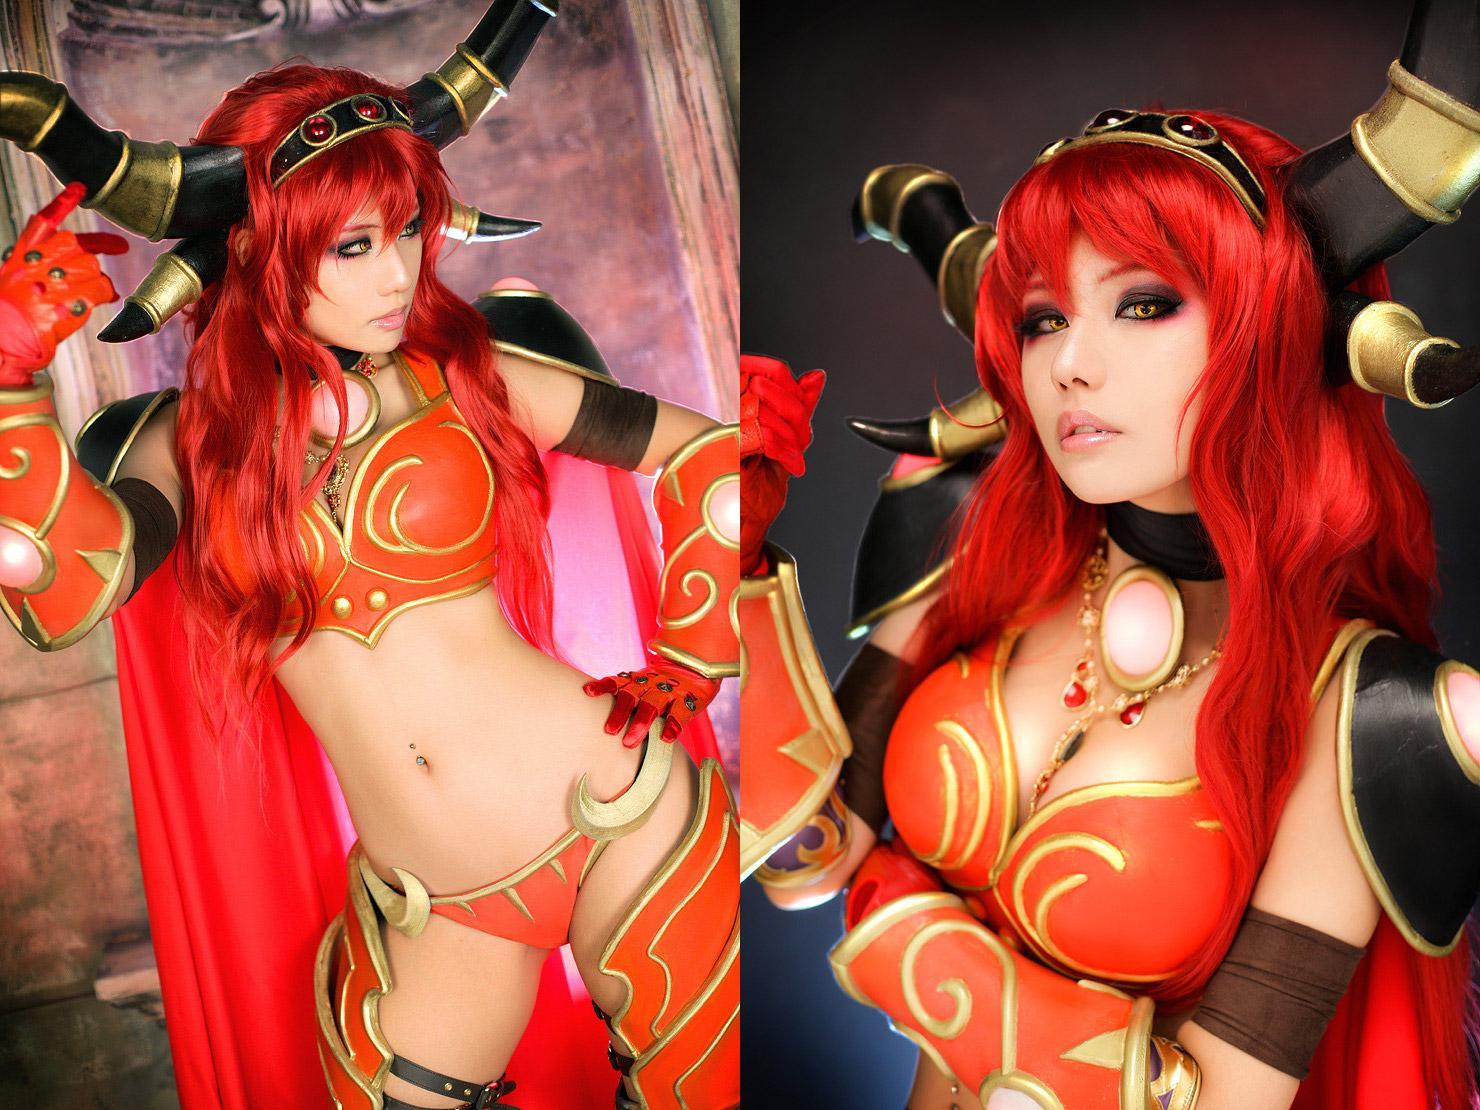 Alexstrasza (World of Warcraft) par Tasha #wow #cosplay http://t.co/cObymG2ISx